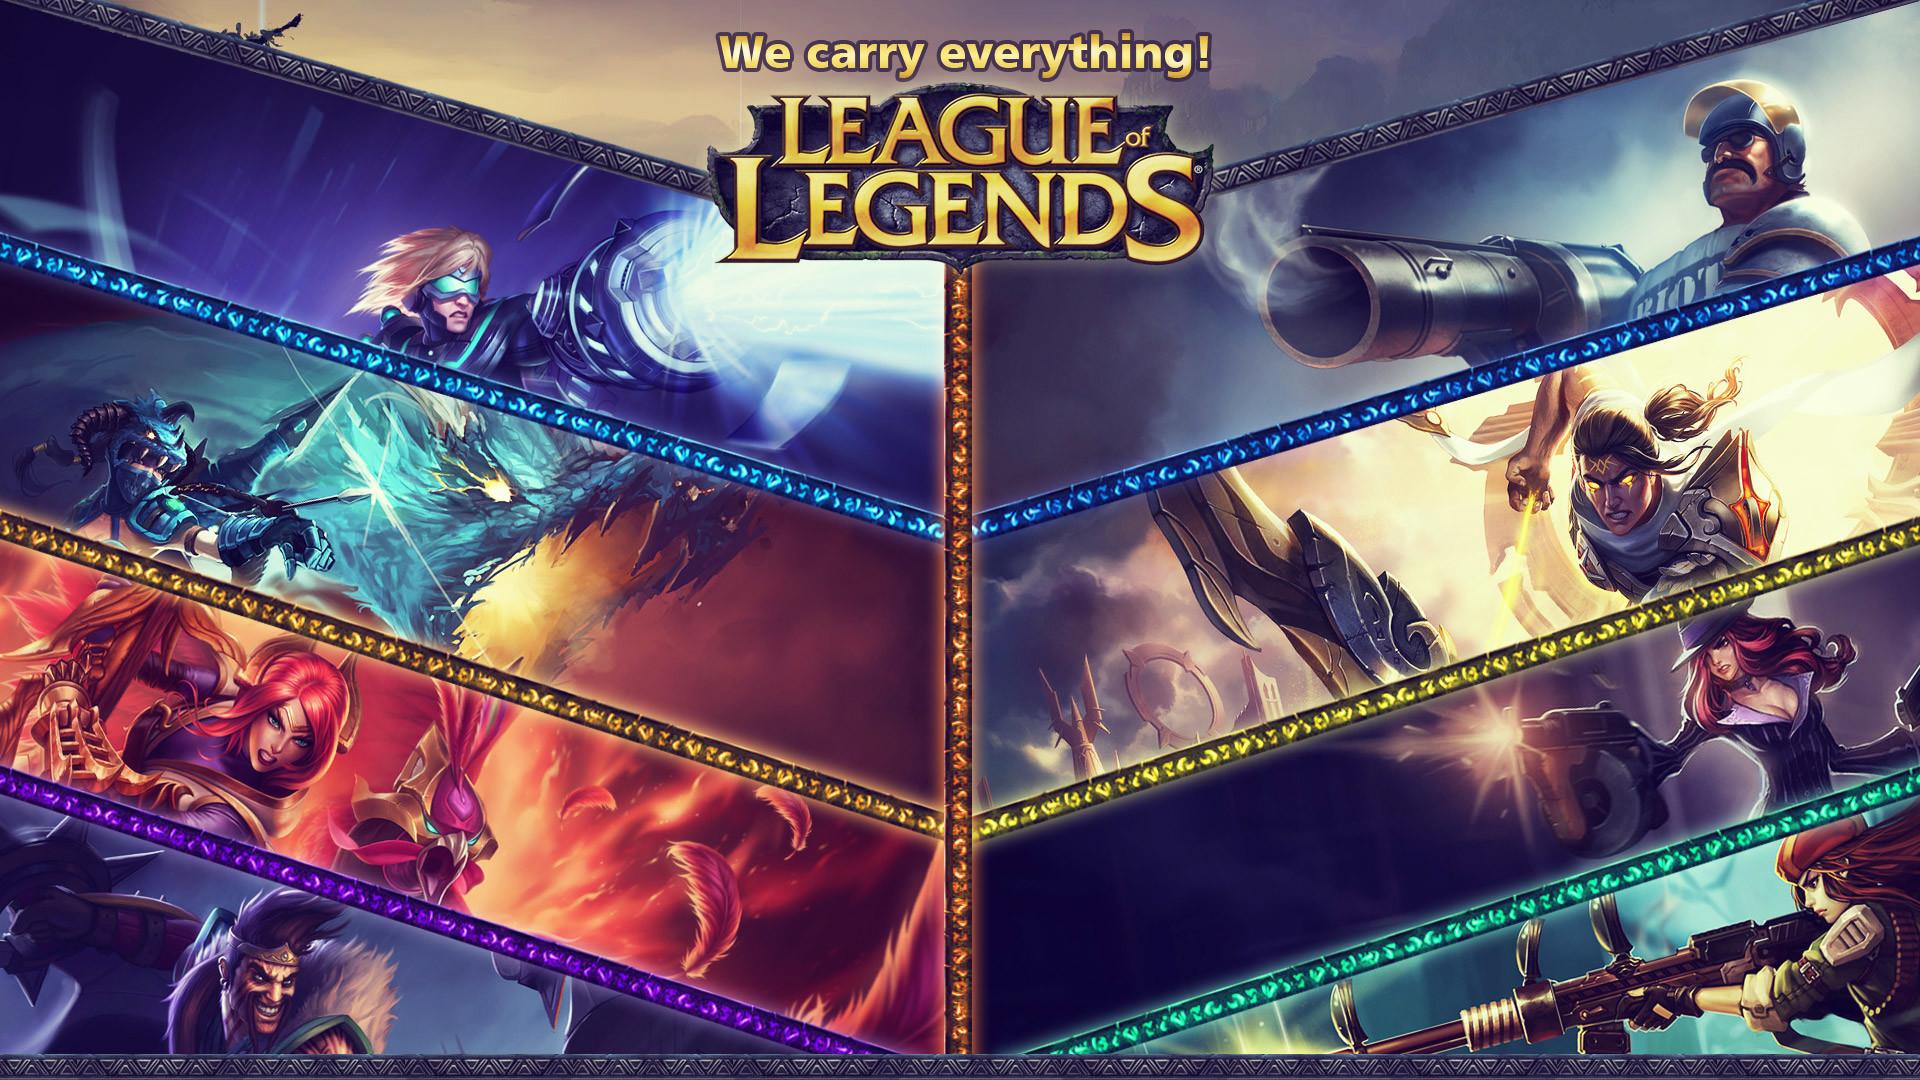 League of Legends ADC wallpaper